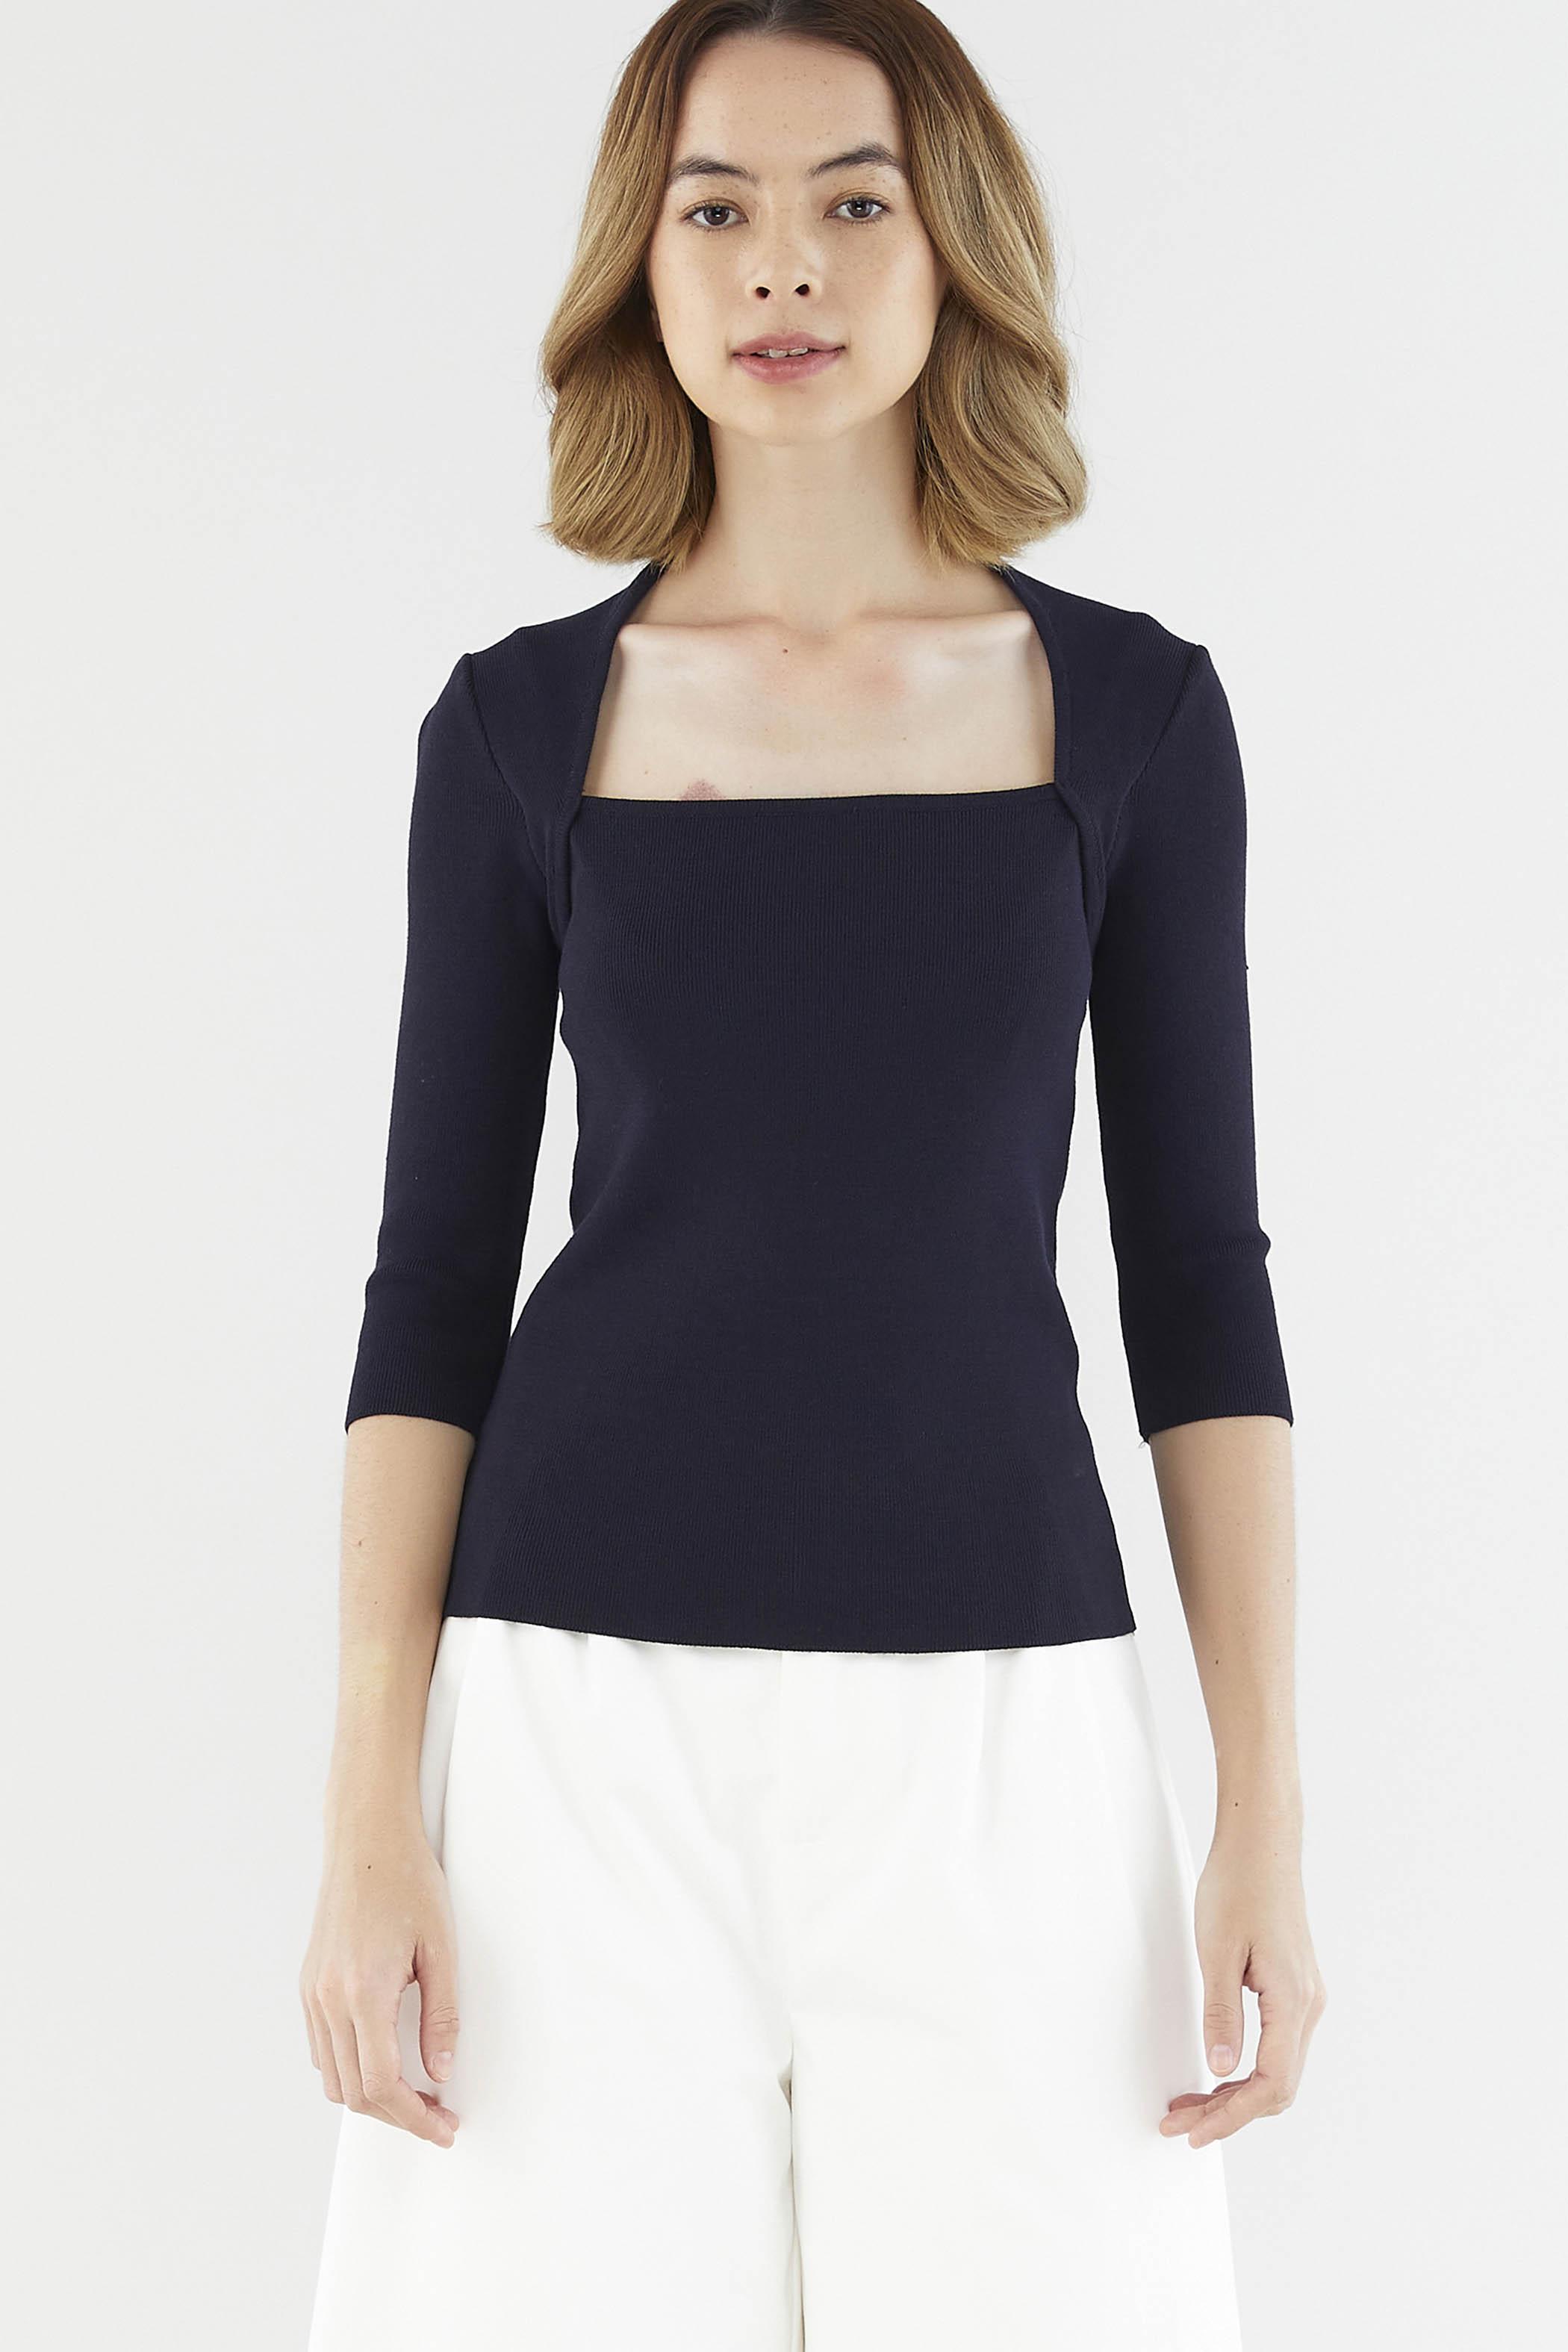 Sheilia Wide-neck Top